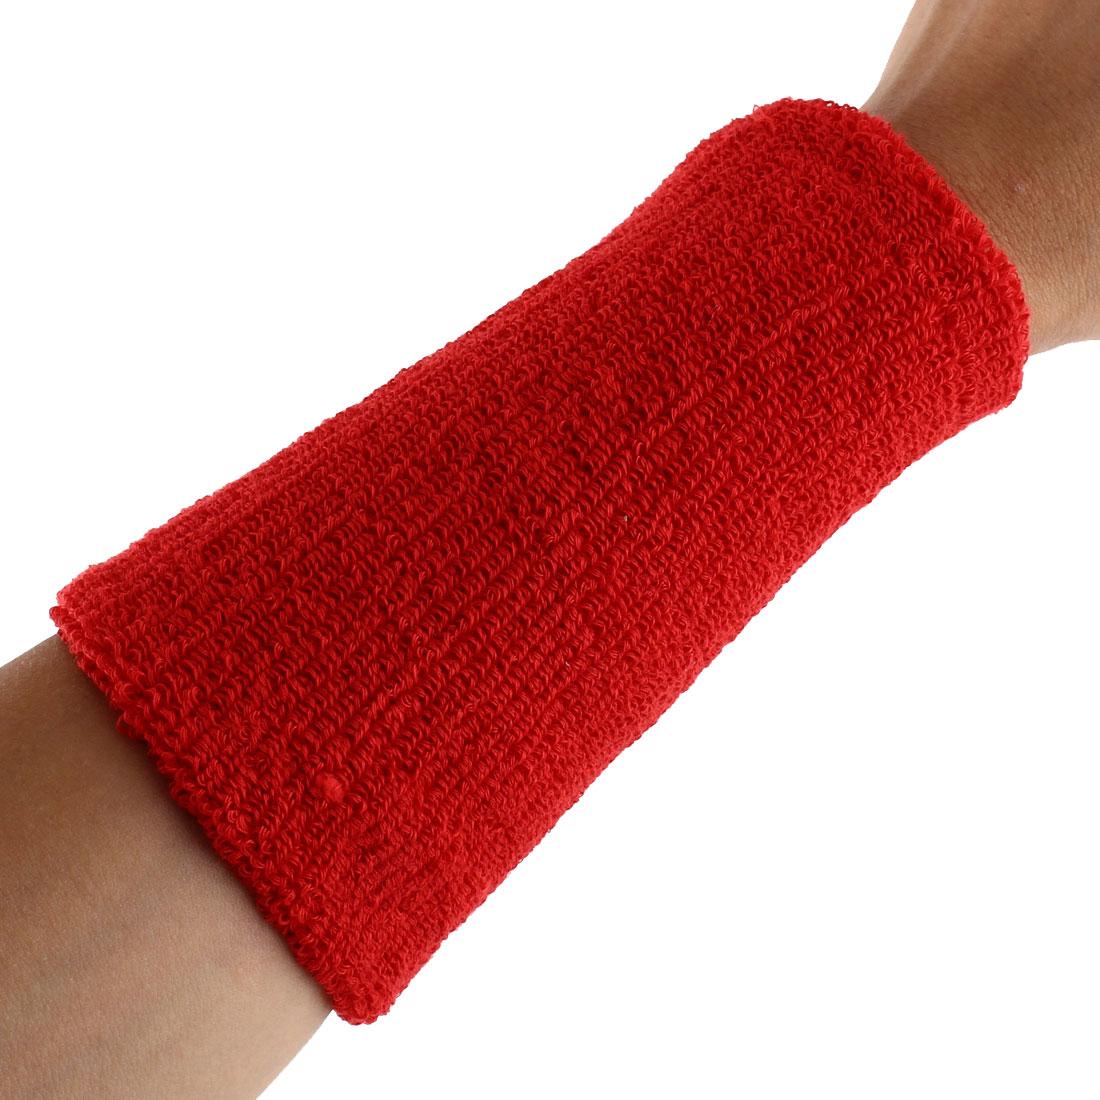 Exercises Basketball Running Hand Support Bandage Sweatband Wristband Sport Wrist Red 15cm Long 2pcs